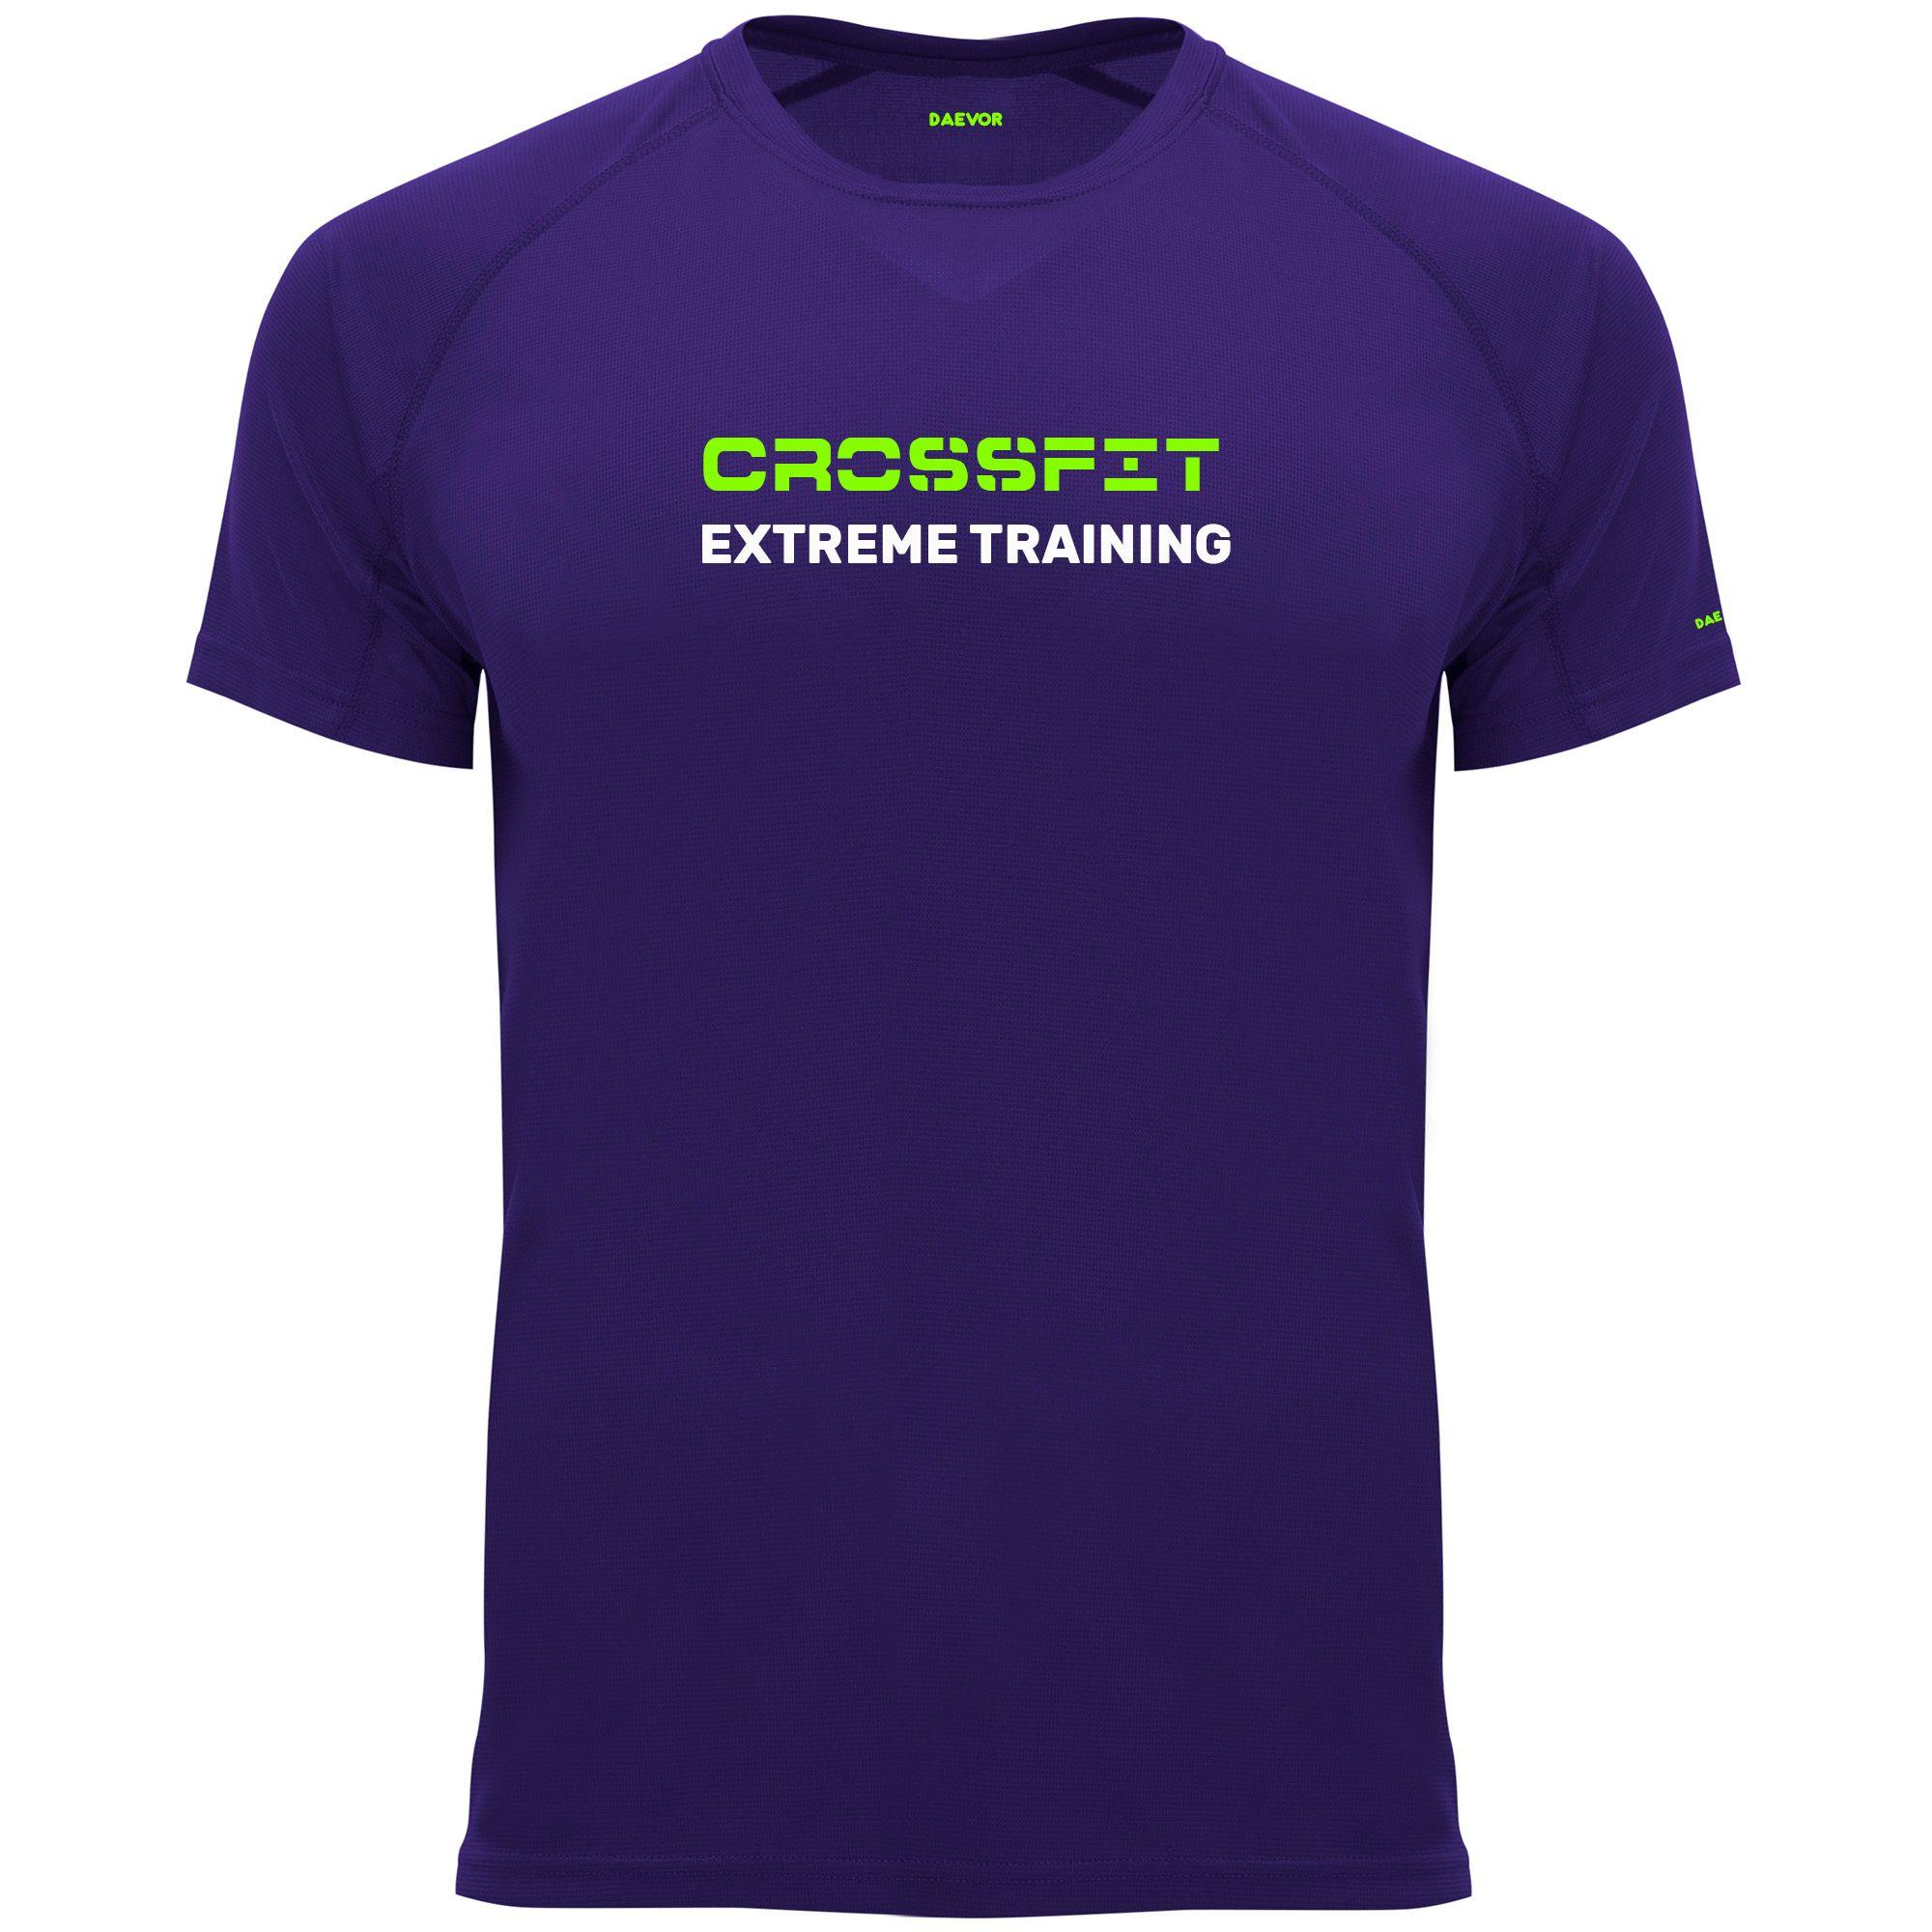 Camiseta Daevor Croosfit Extreme Training